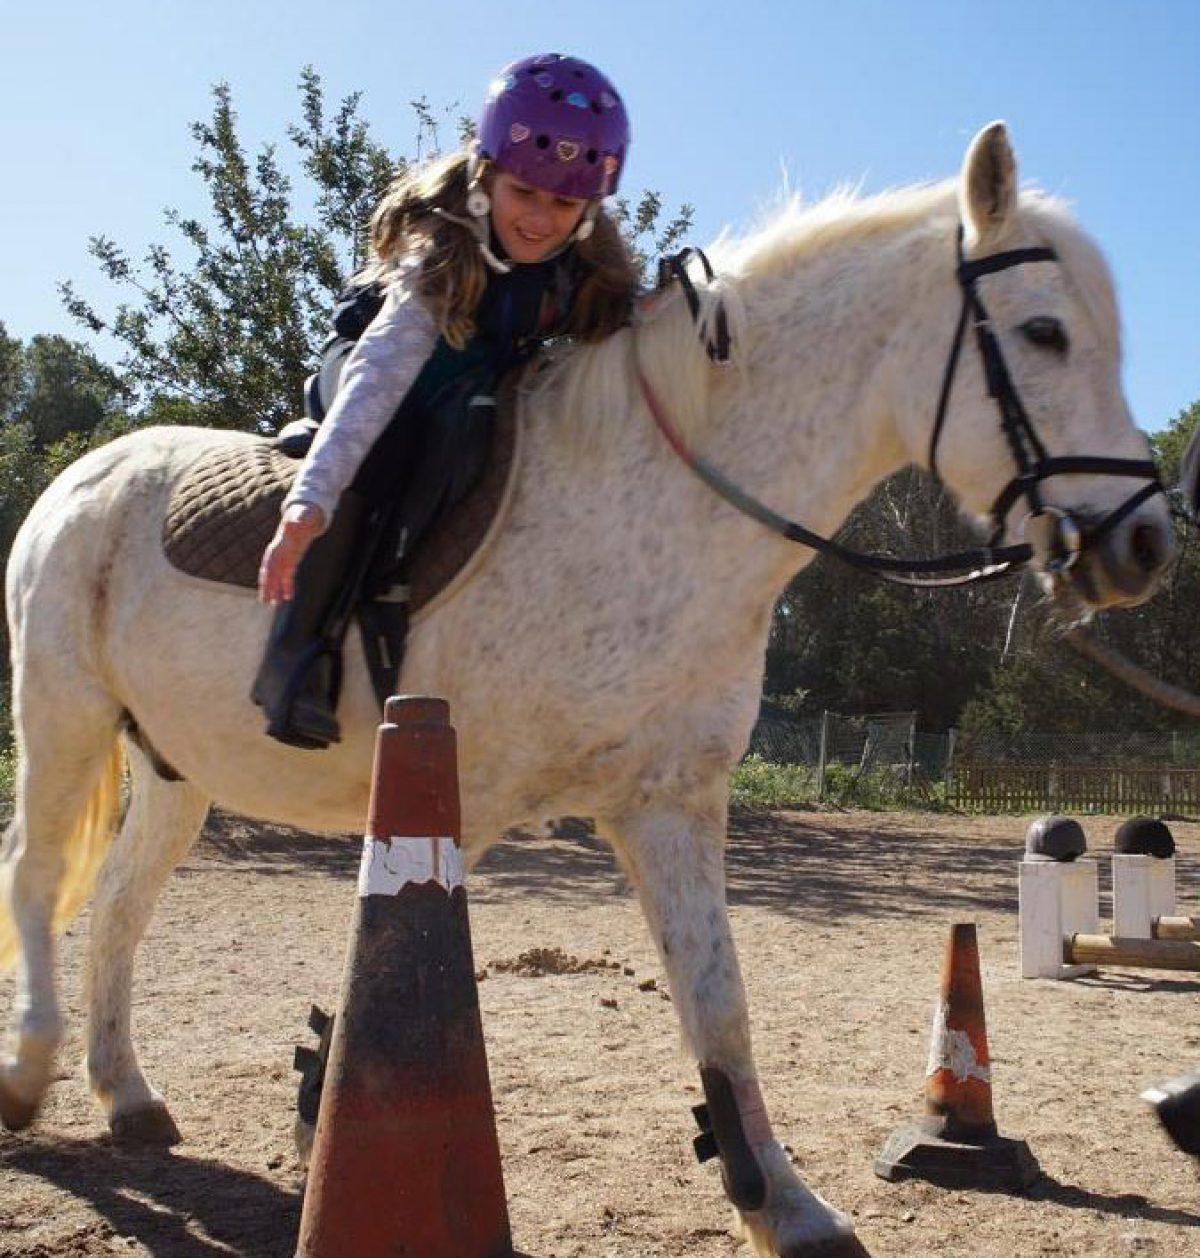 courses-initiation-horse-riding-ibiza-horses-welcometoibiza